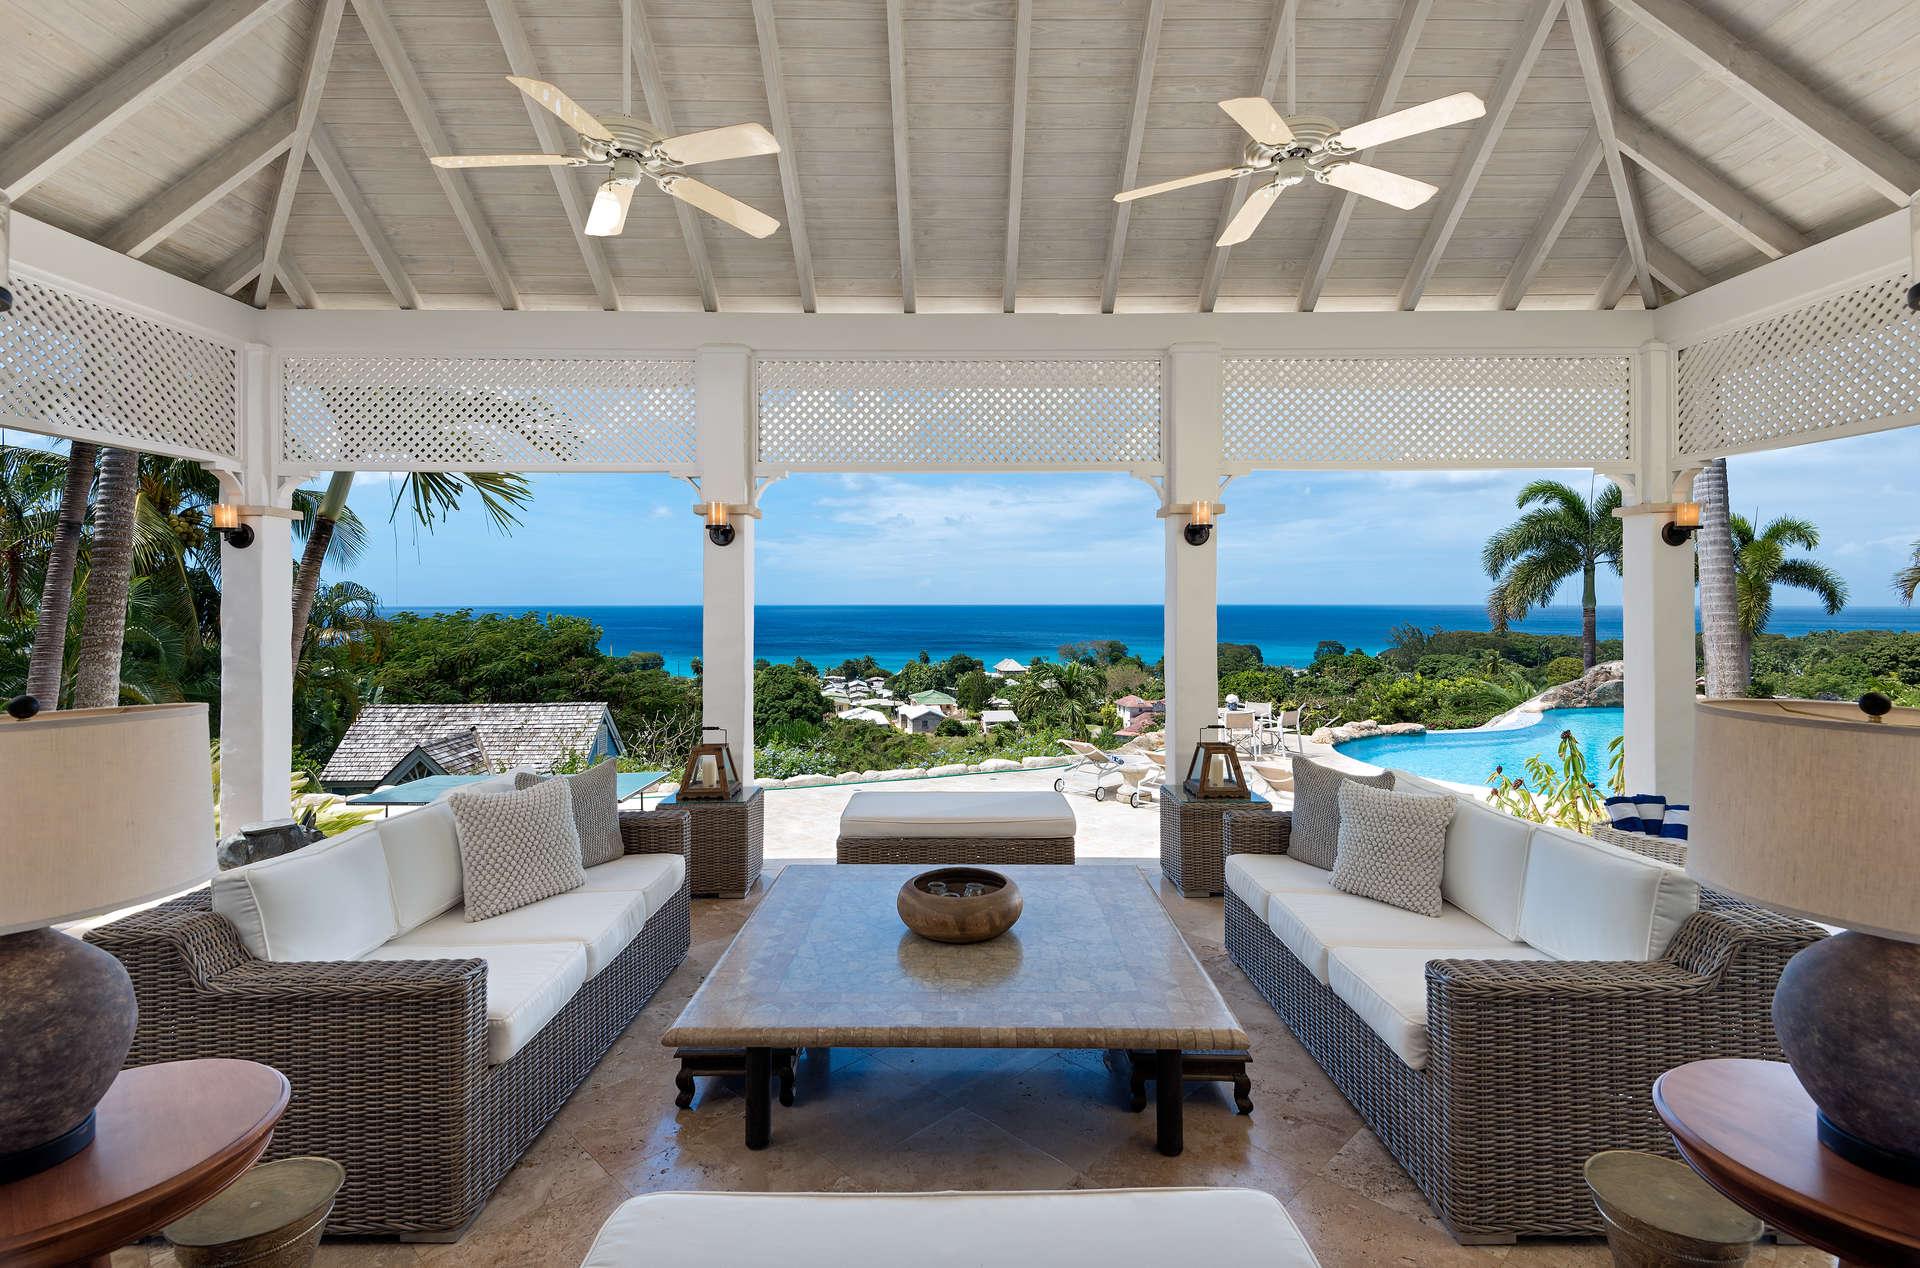 Luxury villa rentals caribbean - Barbados - St james - Sugar hill resort - Sunwatch - Image 1/22